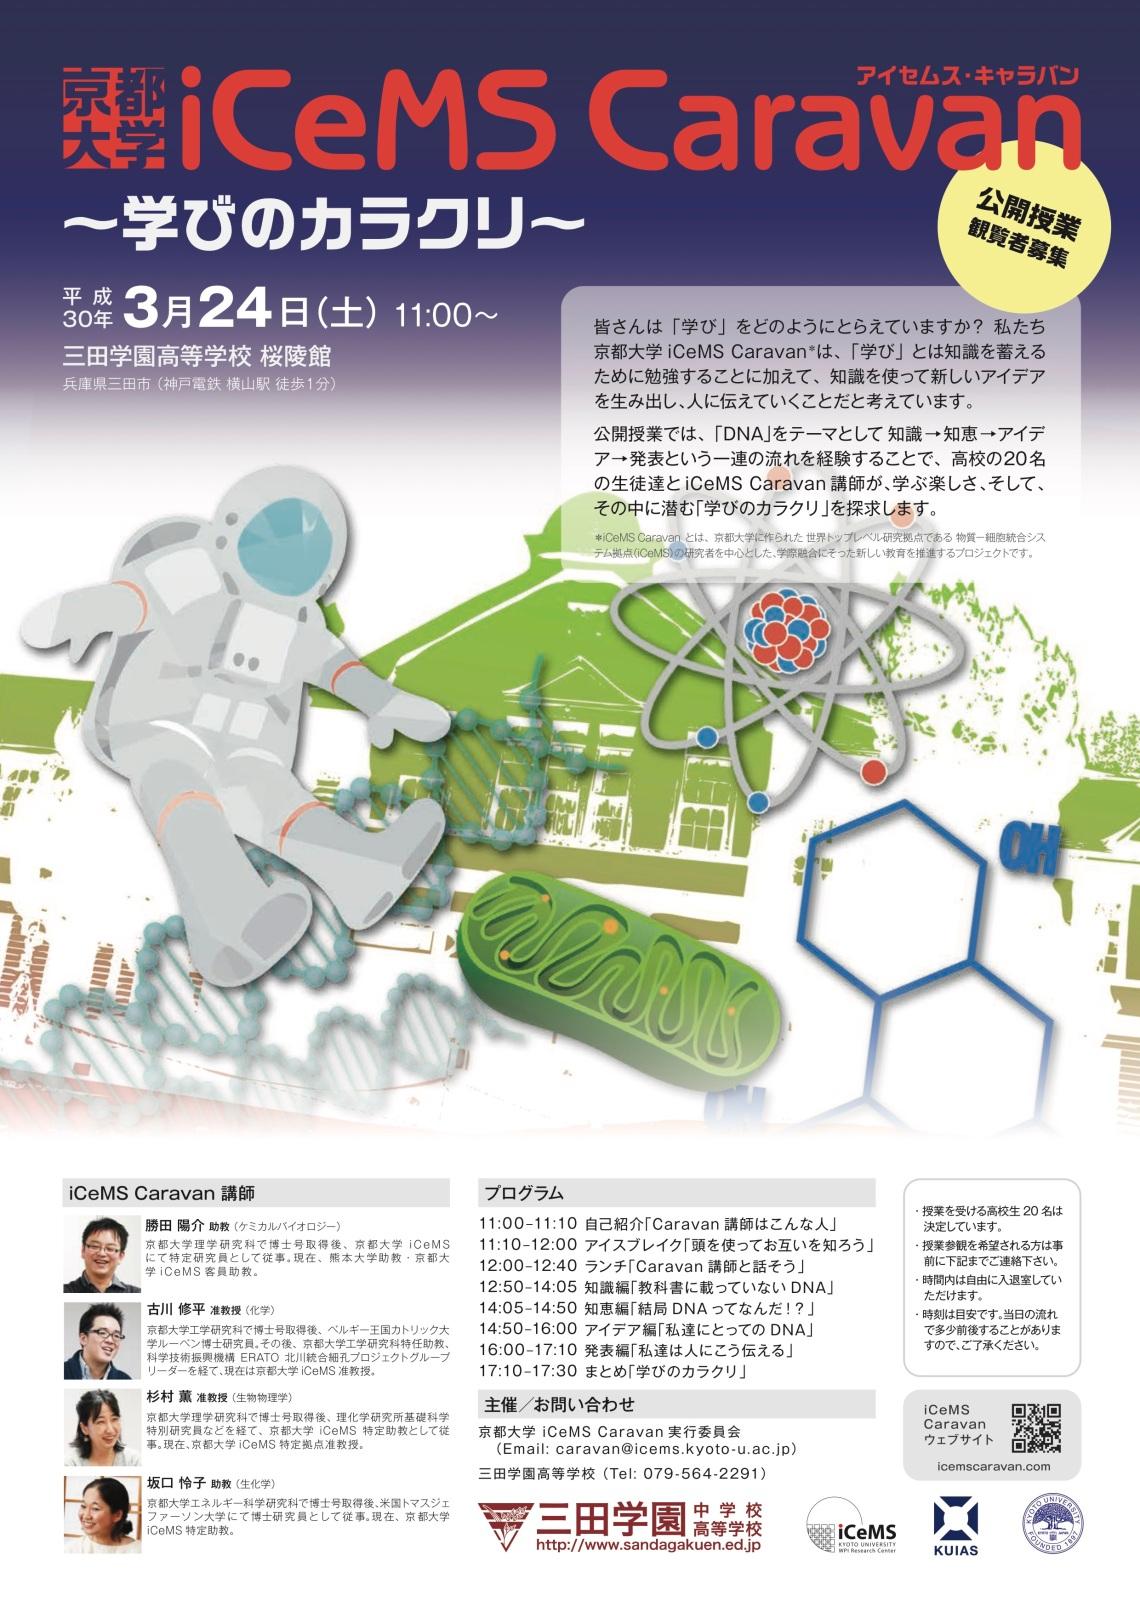 iCeMS caravan 三田学園ポスター updated 3